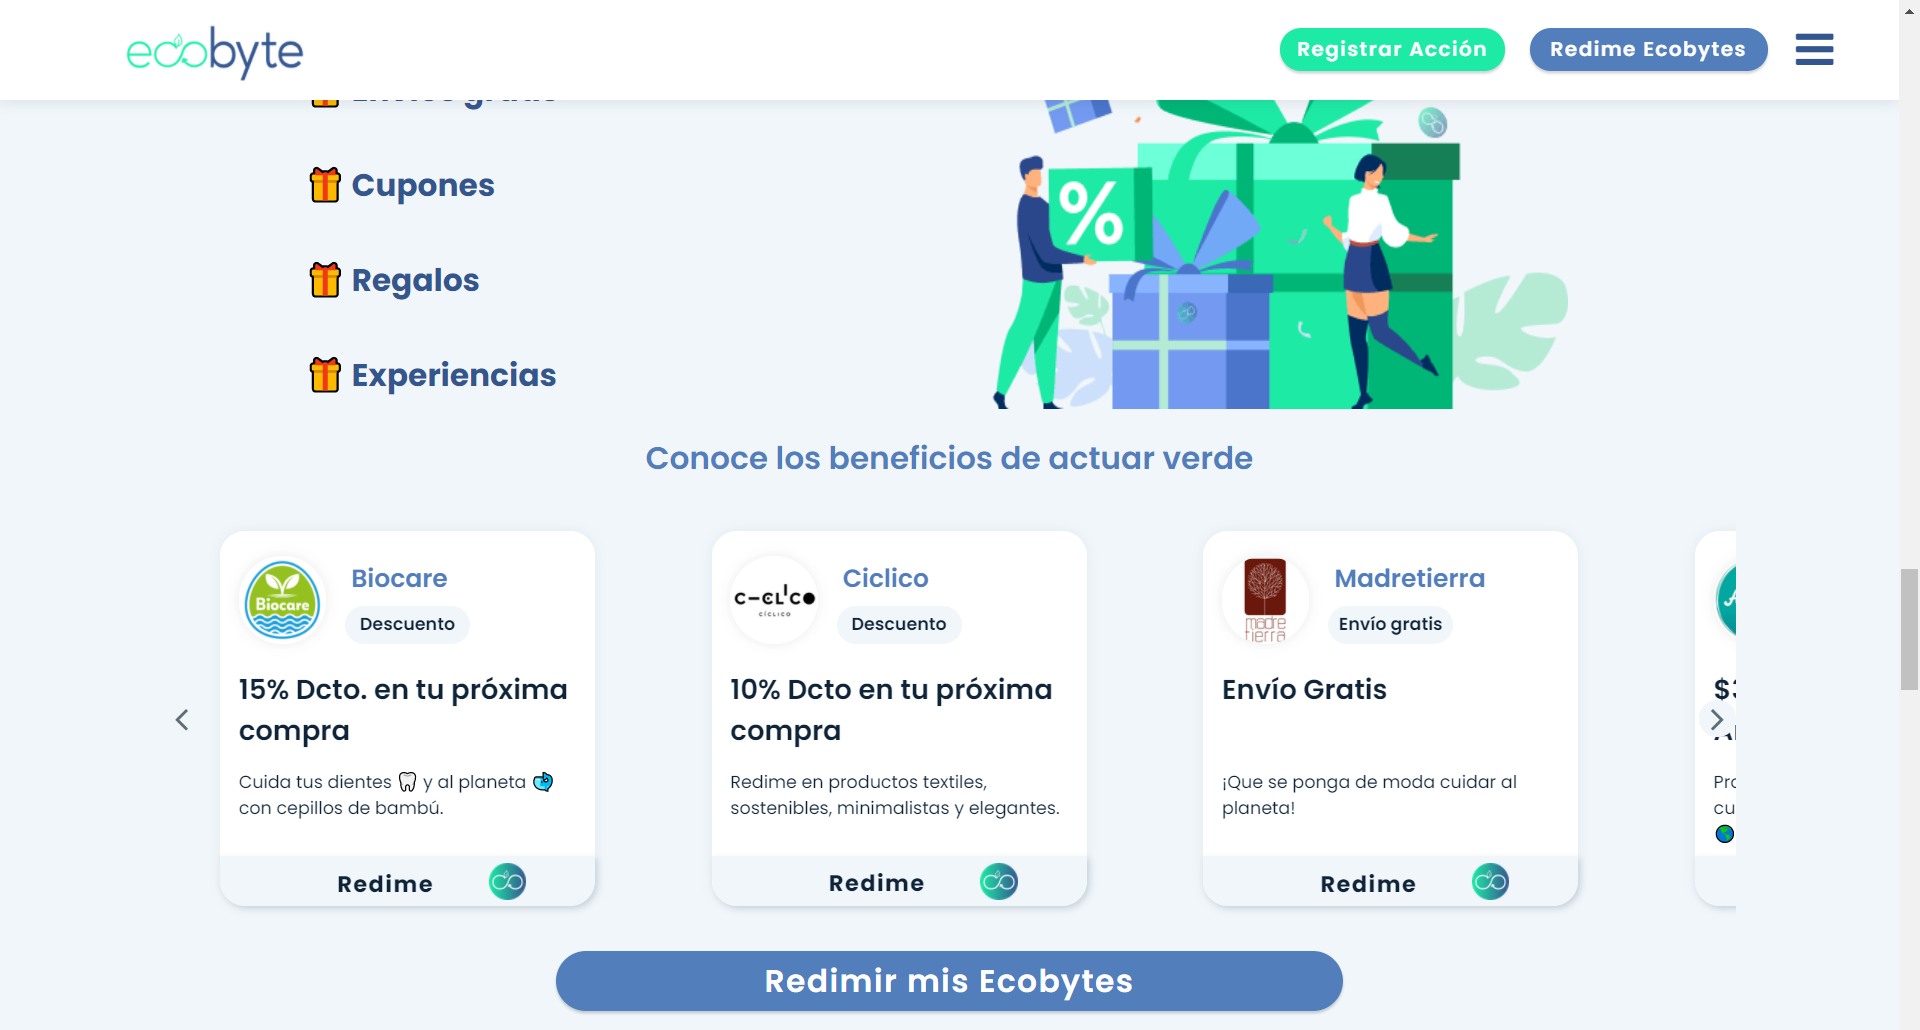 Ecobyte's benefits